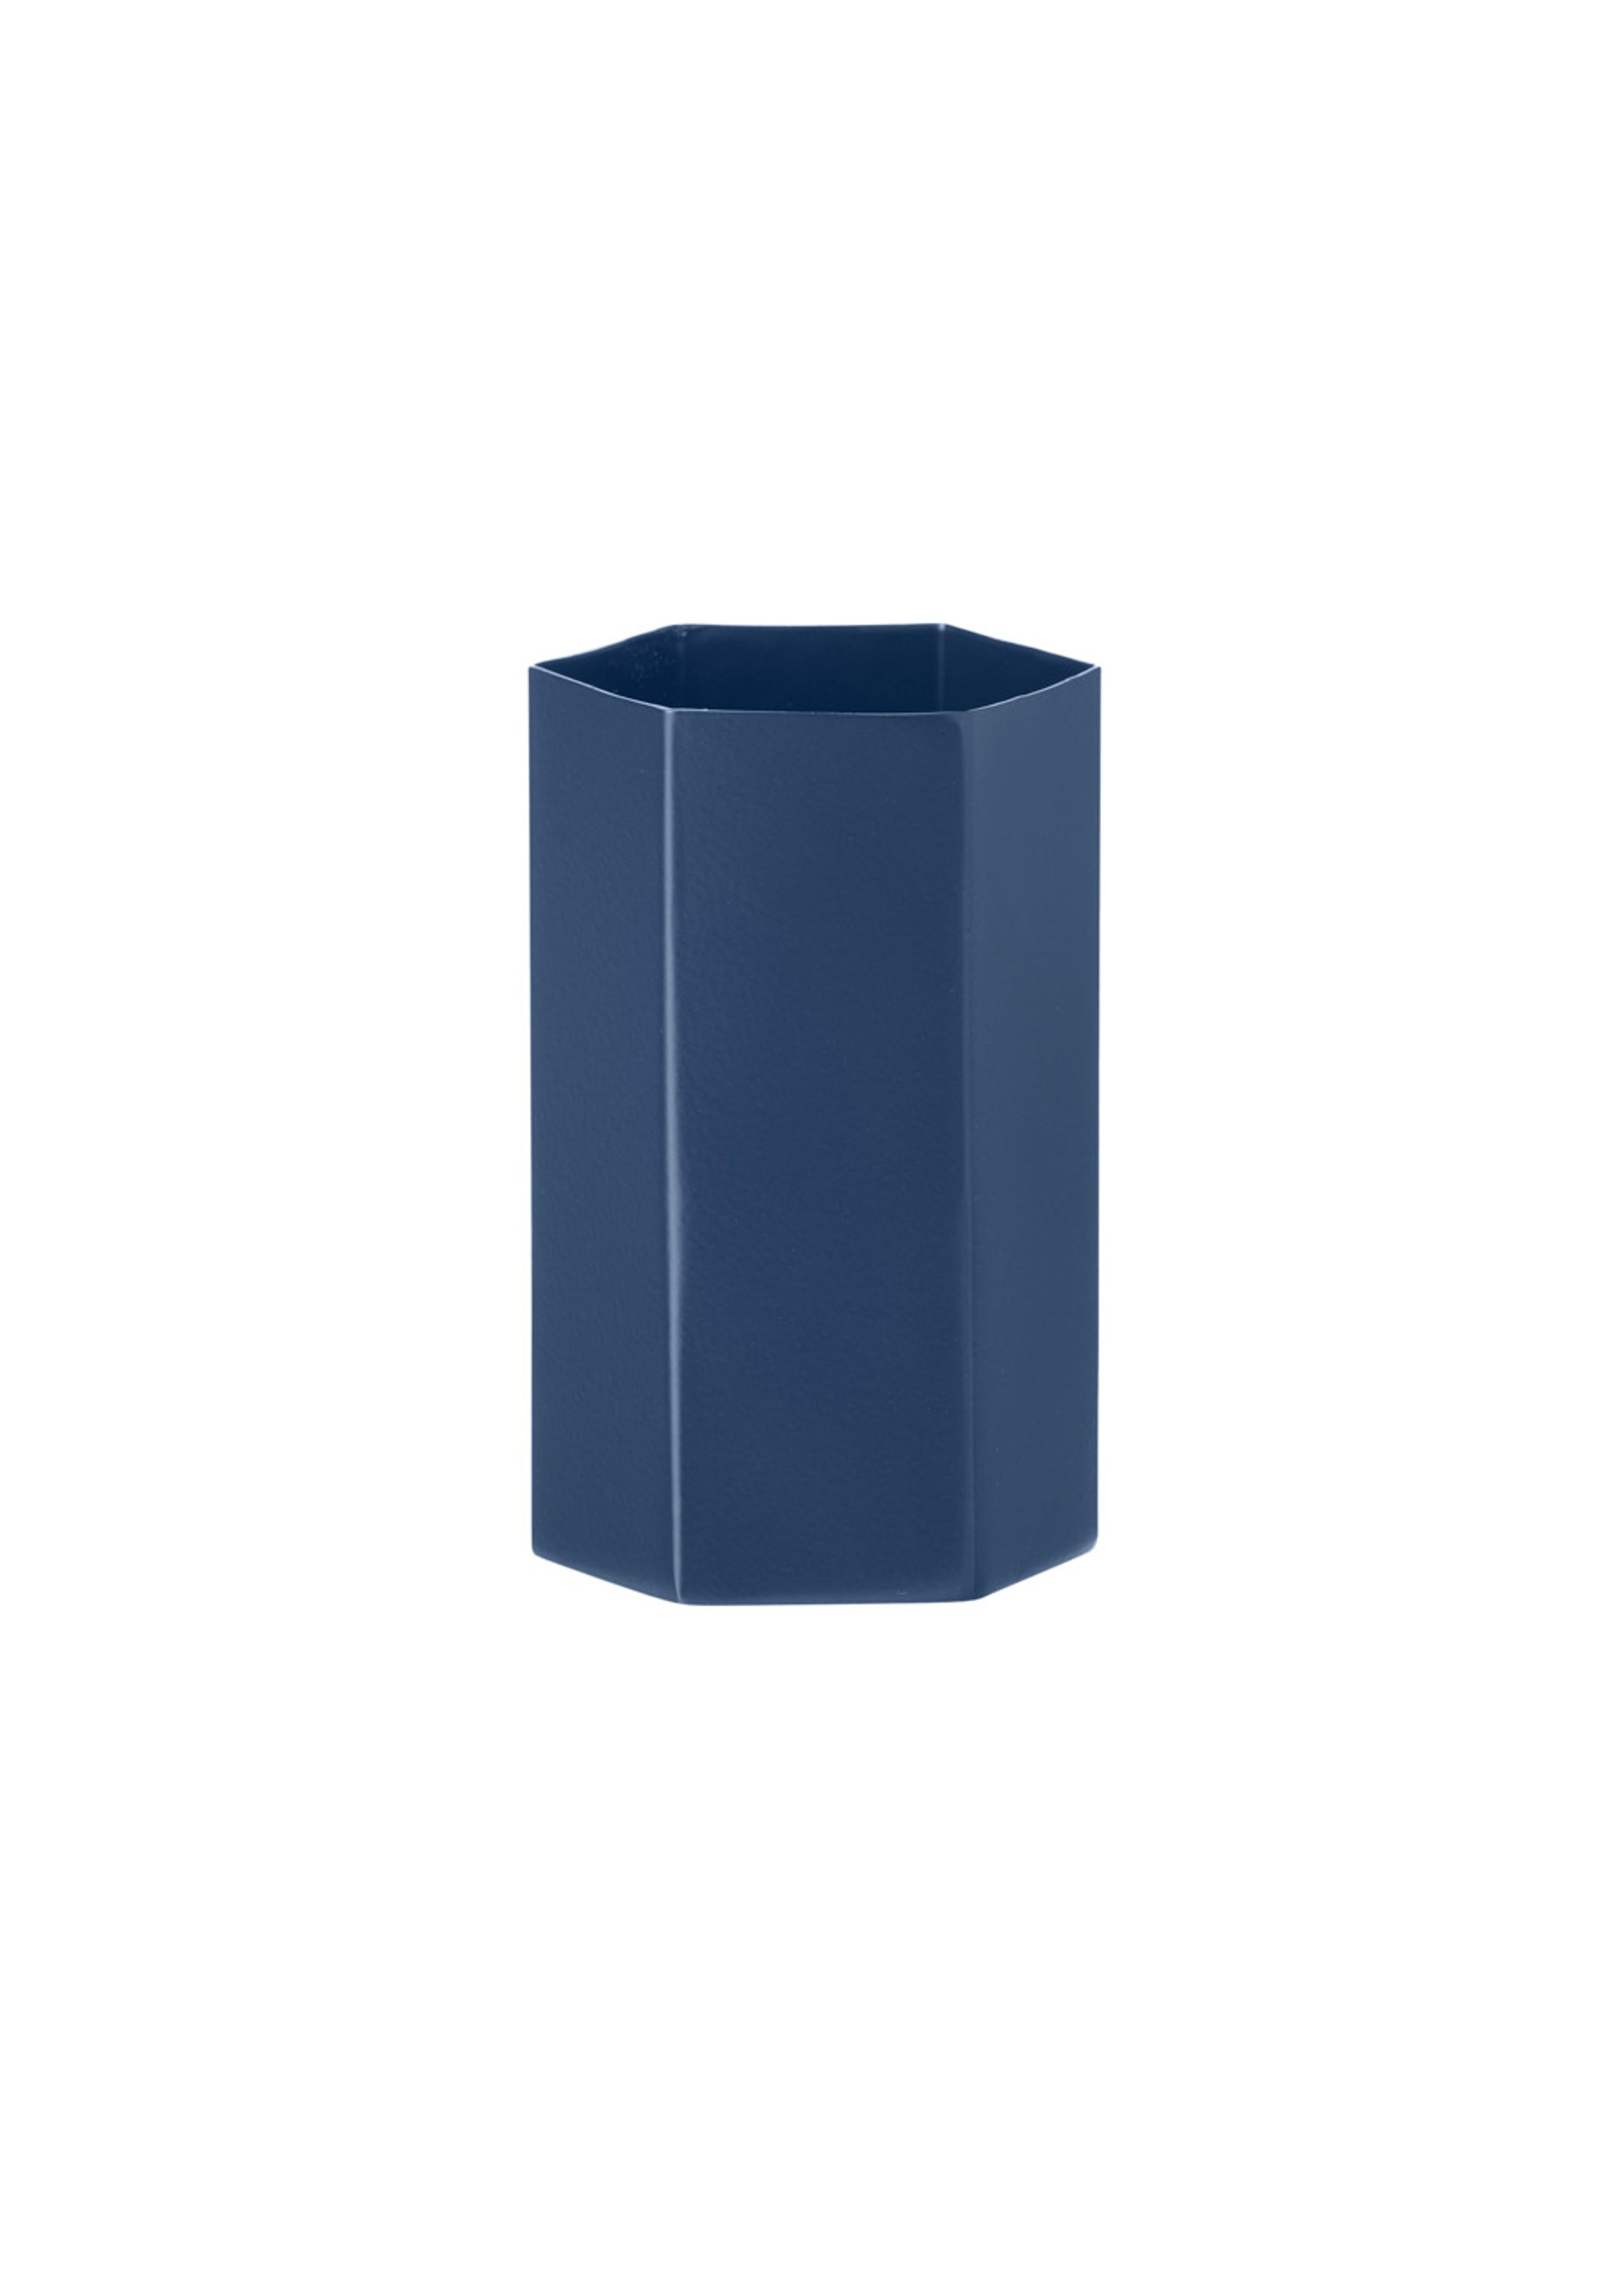 Image of   Hexaon Vase